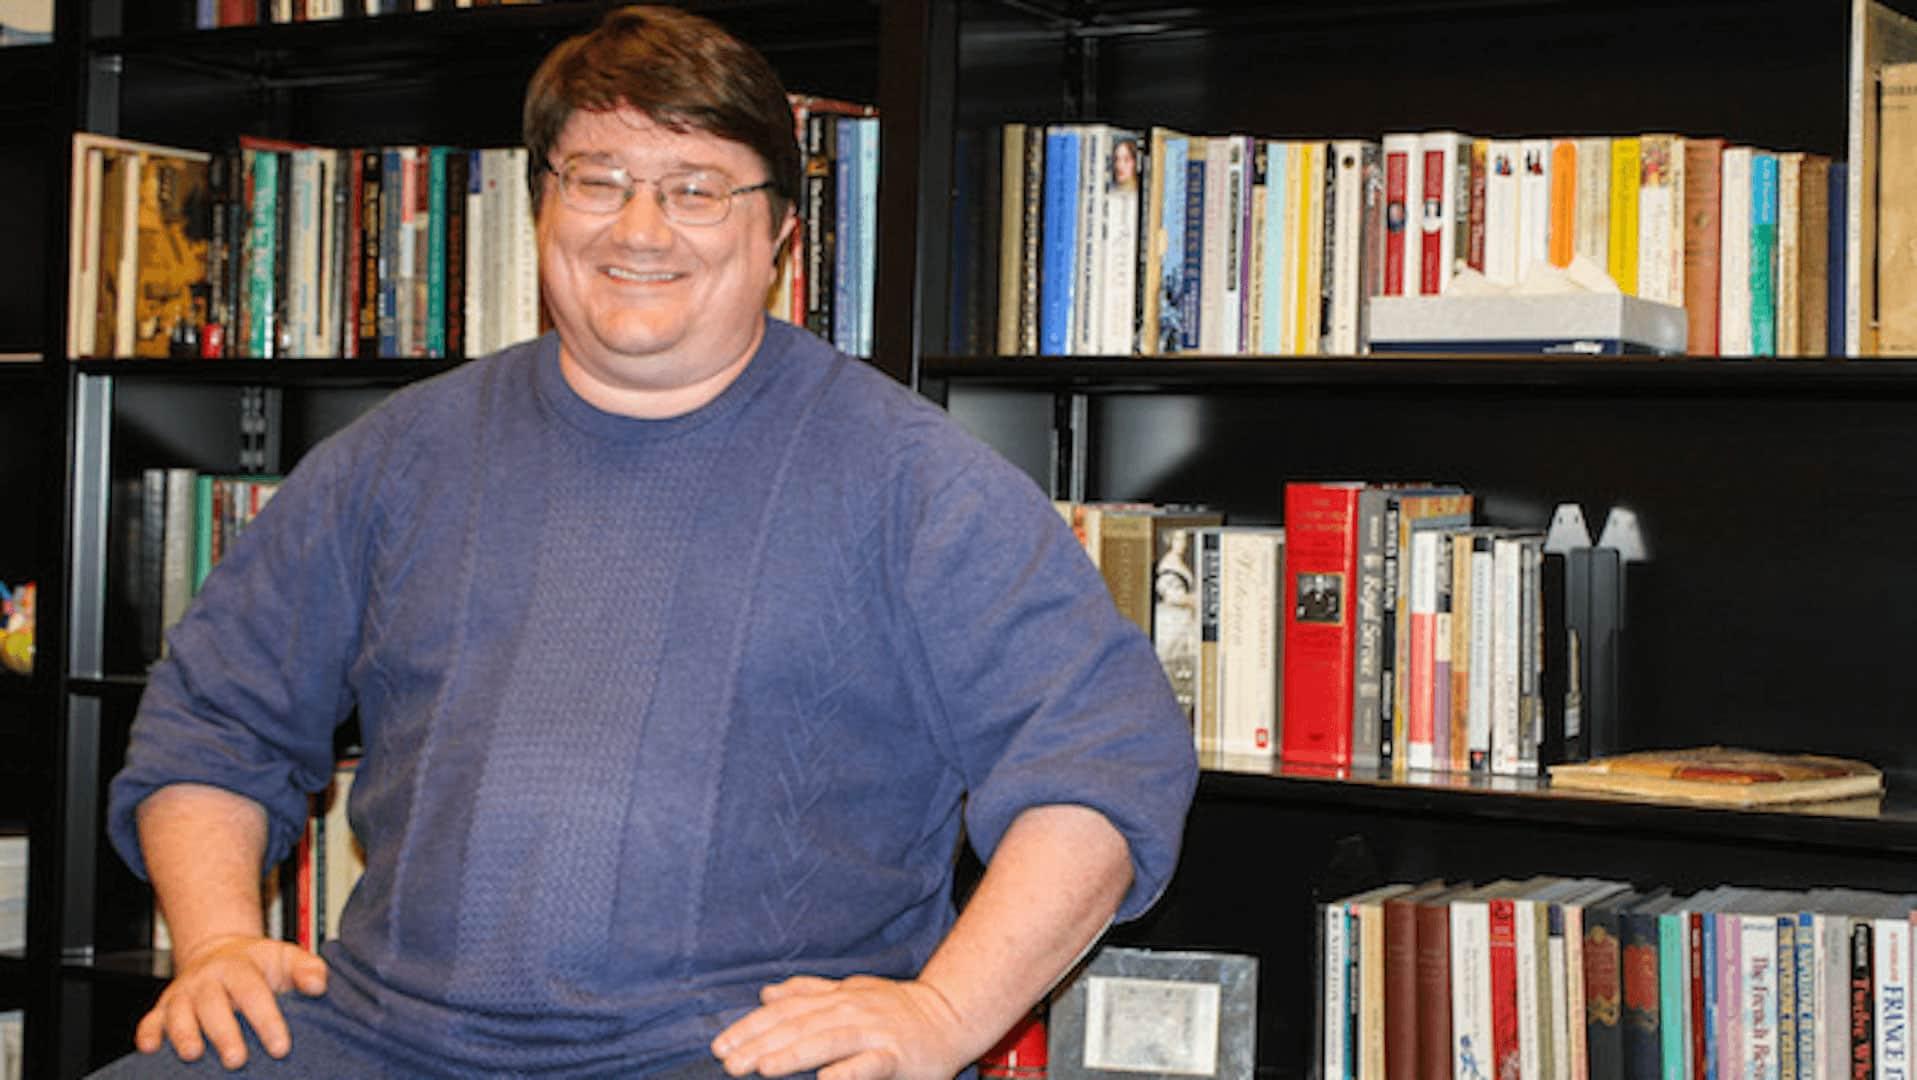 Dr. David Stewart in front of bookshelves.